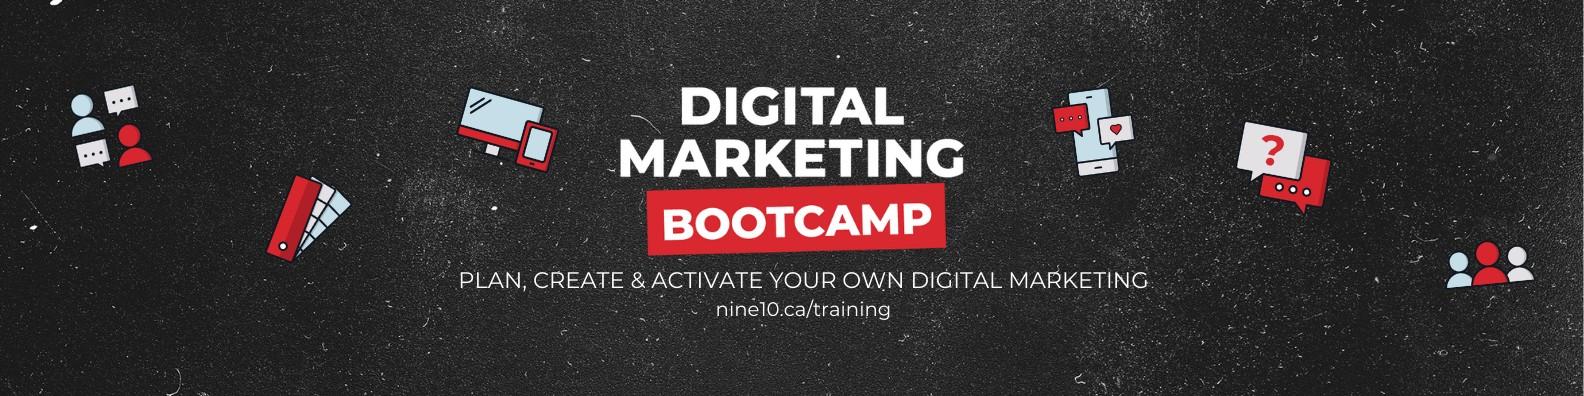 Digital Marketing Bootcamp